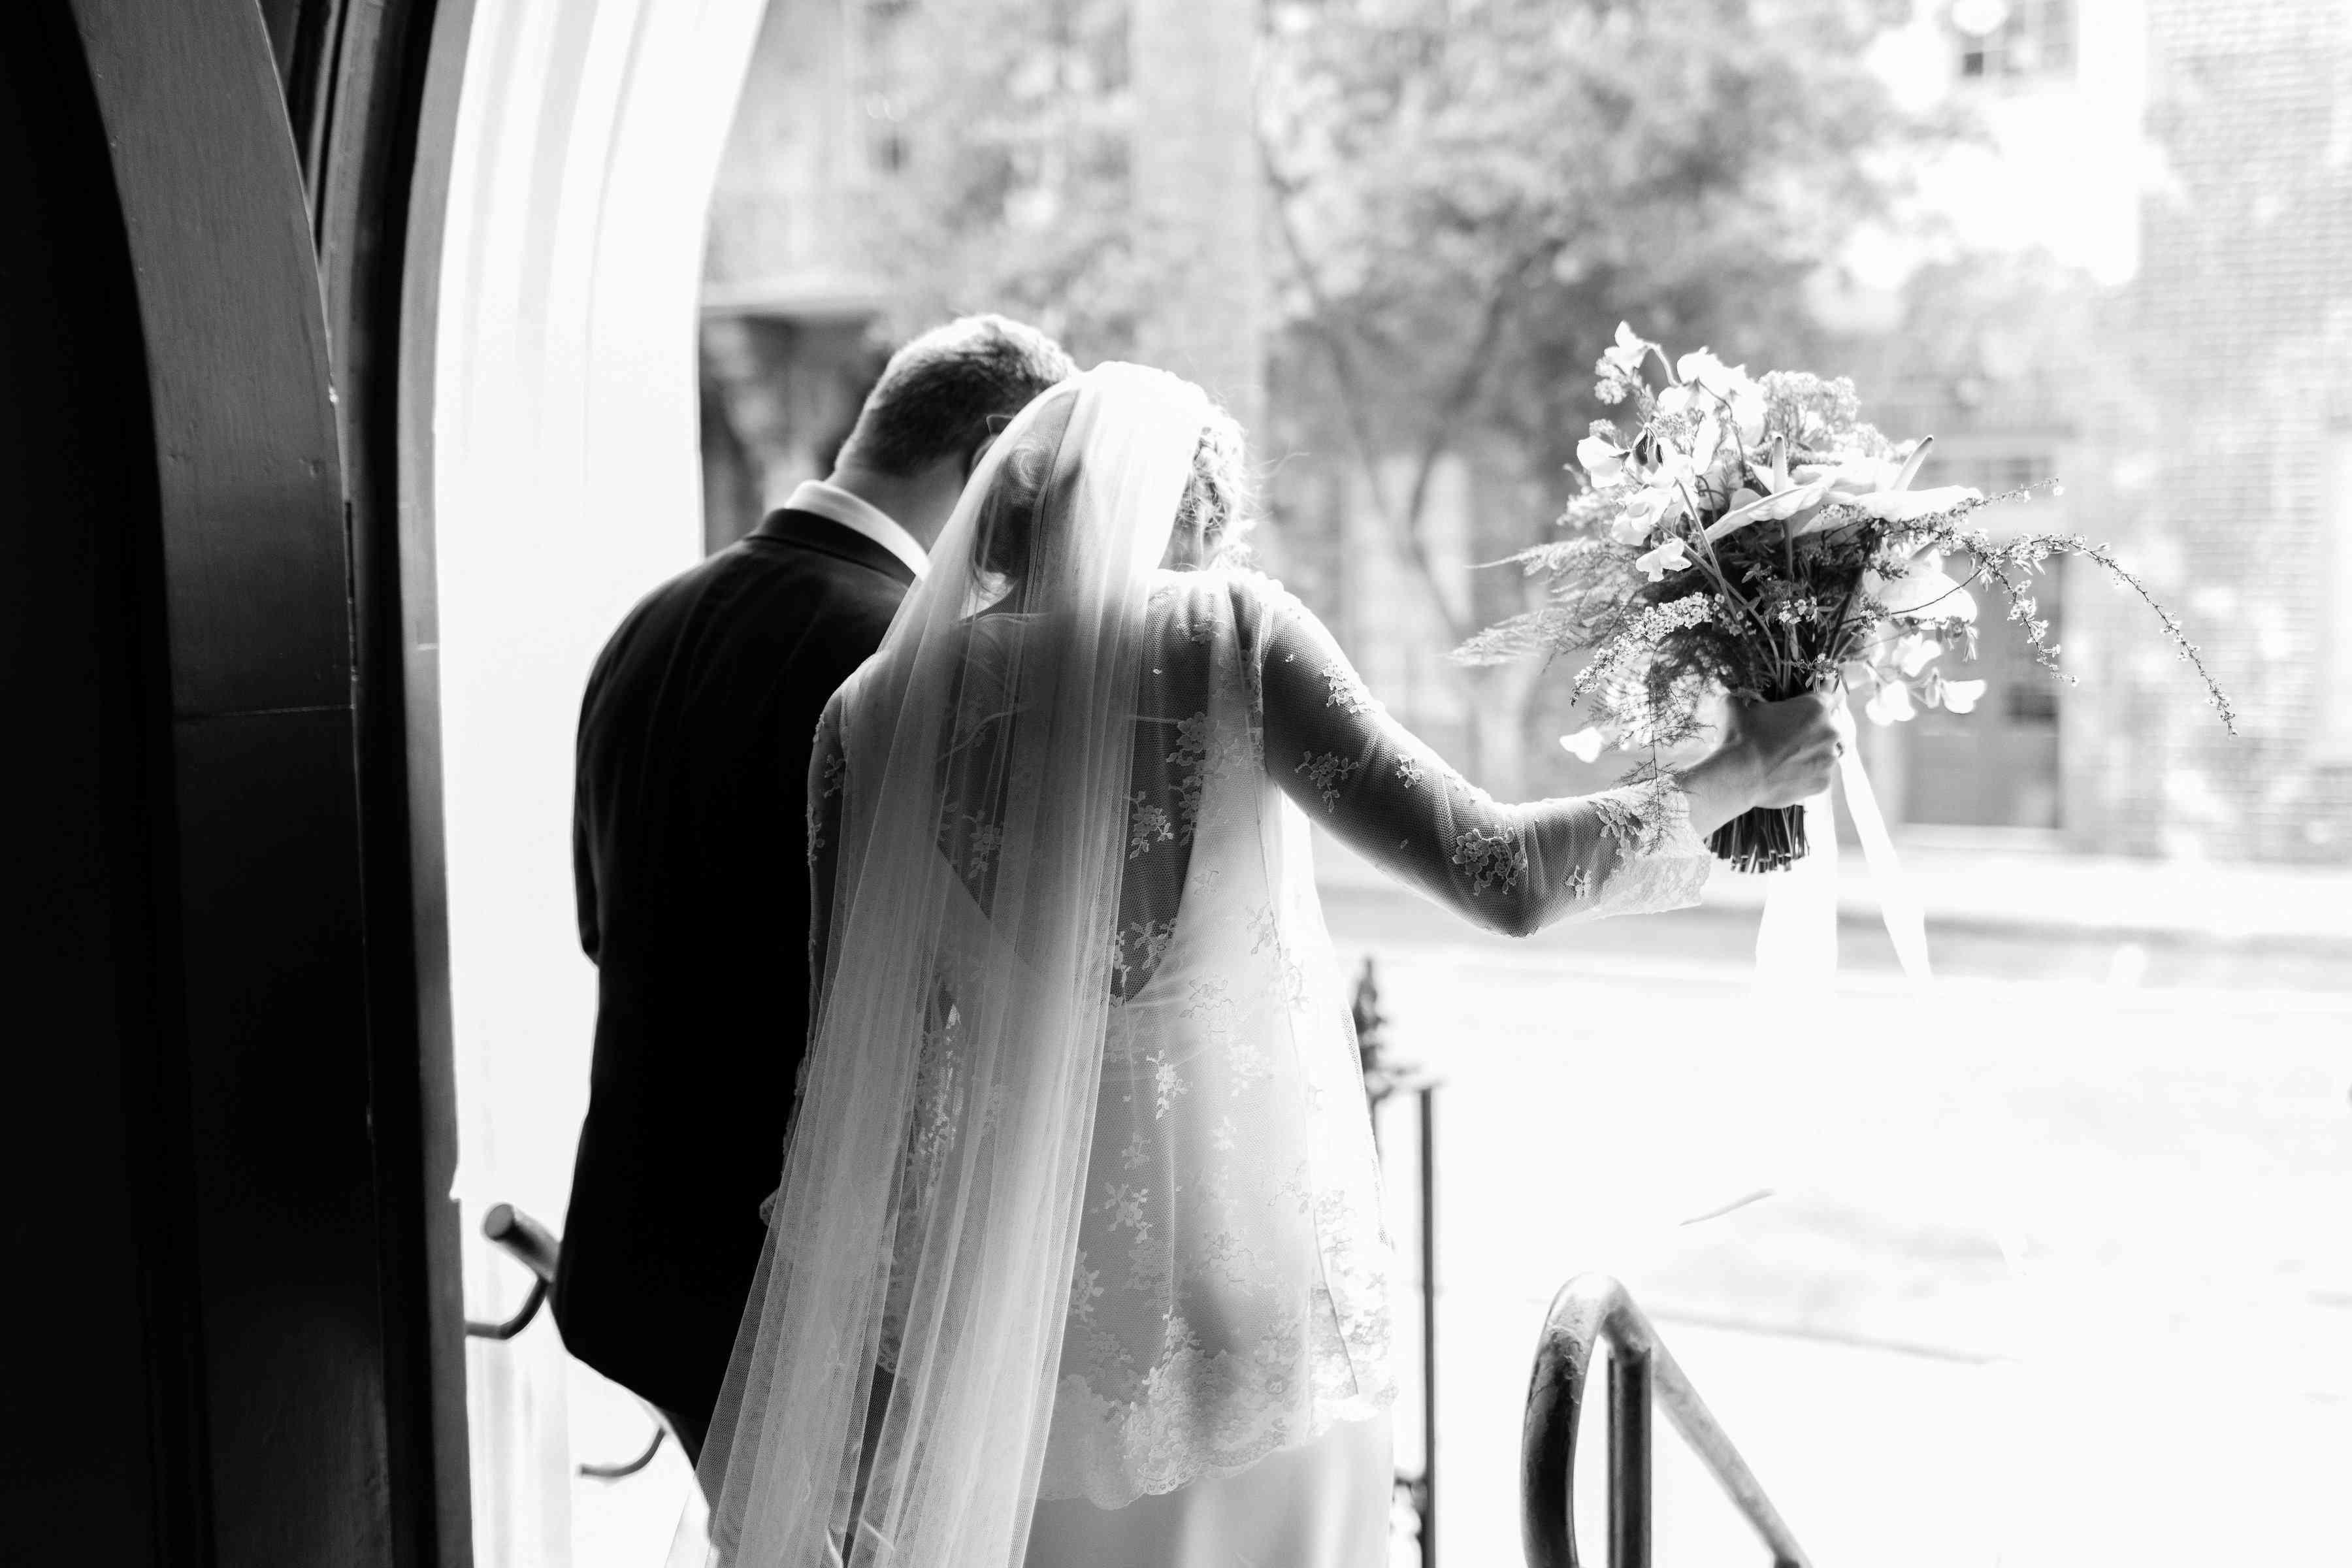 bride and groom exiting church wedding